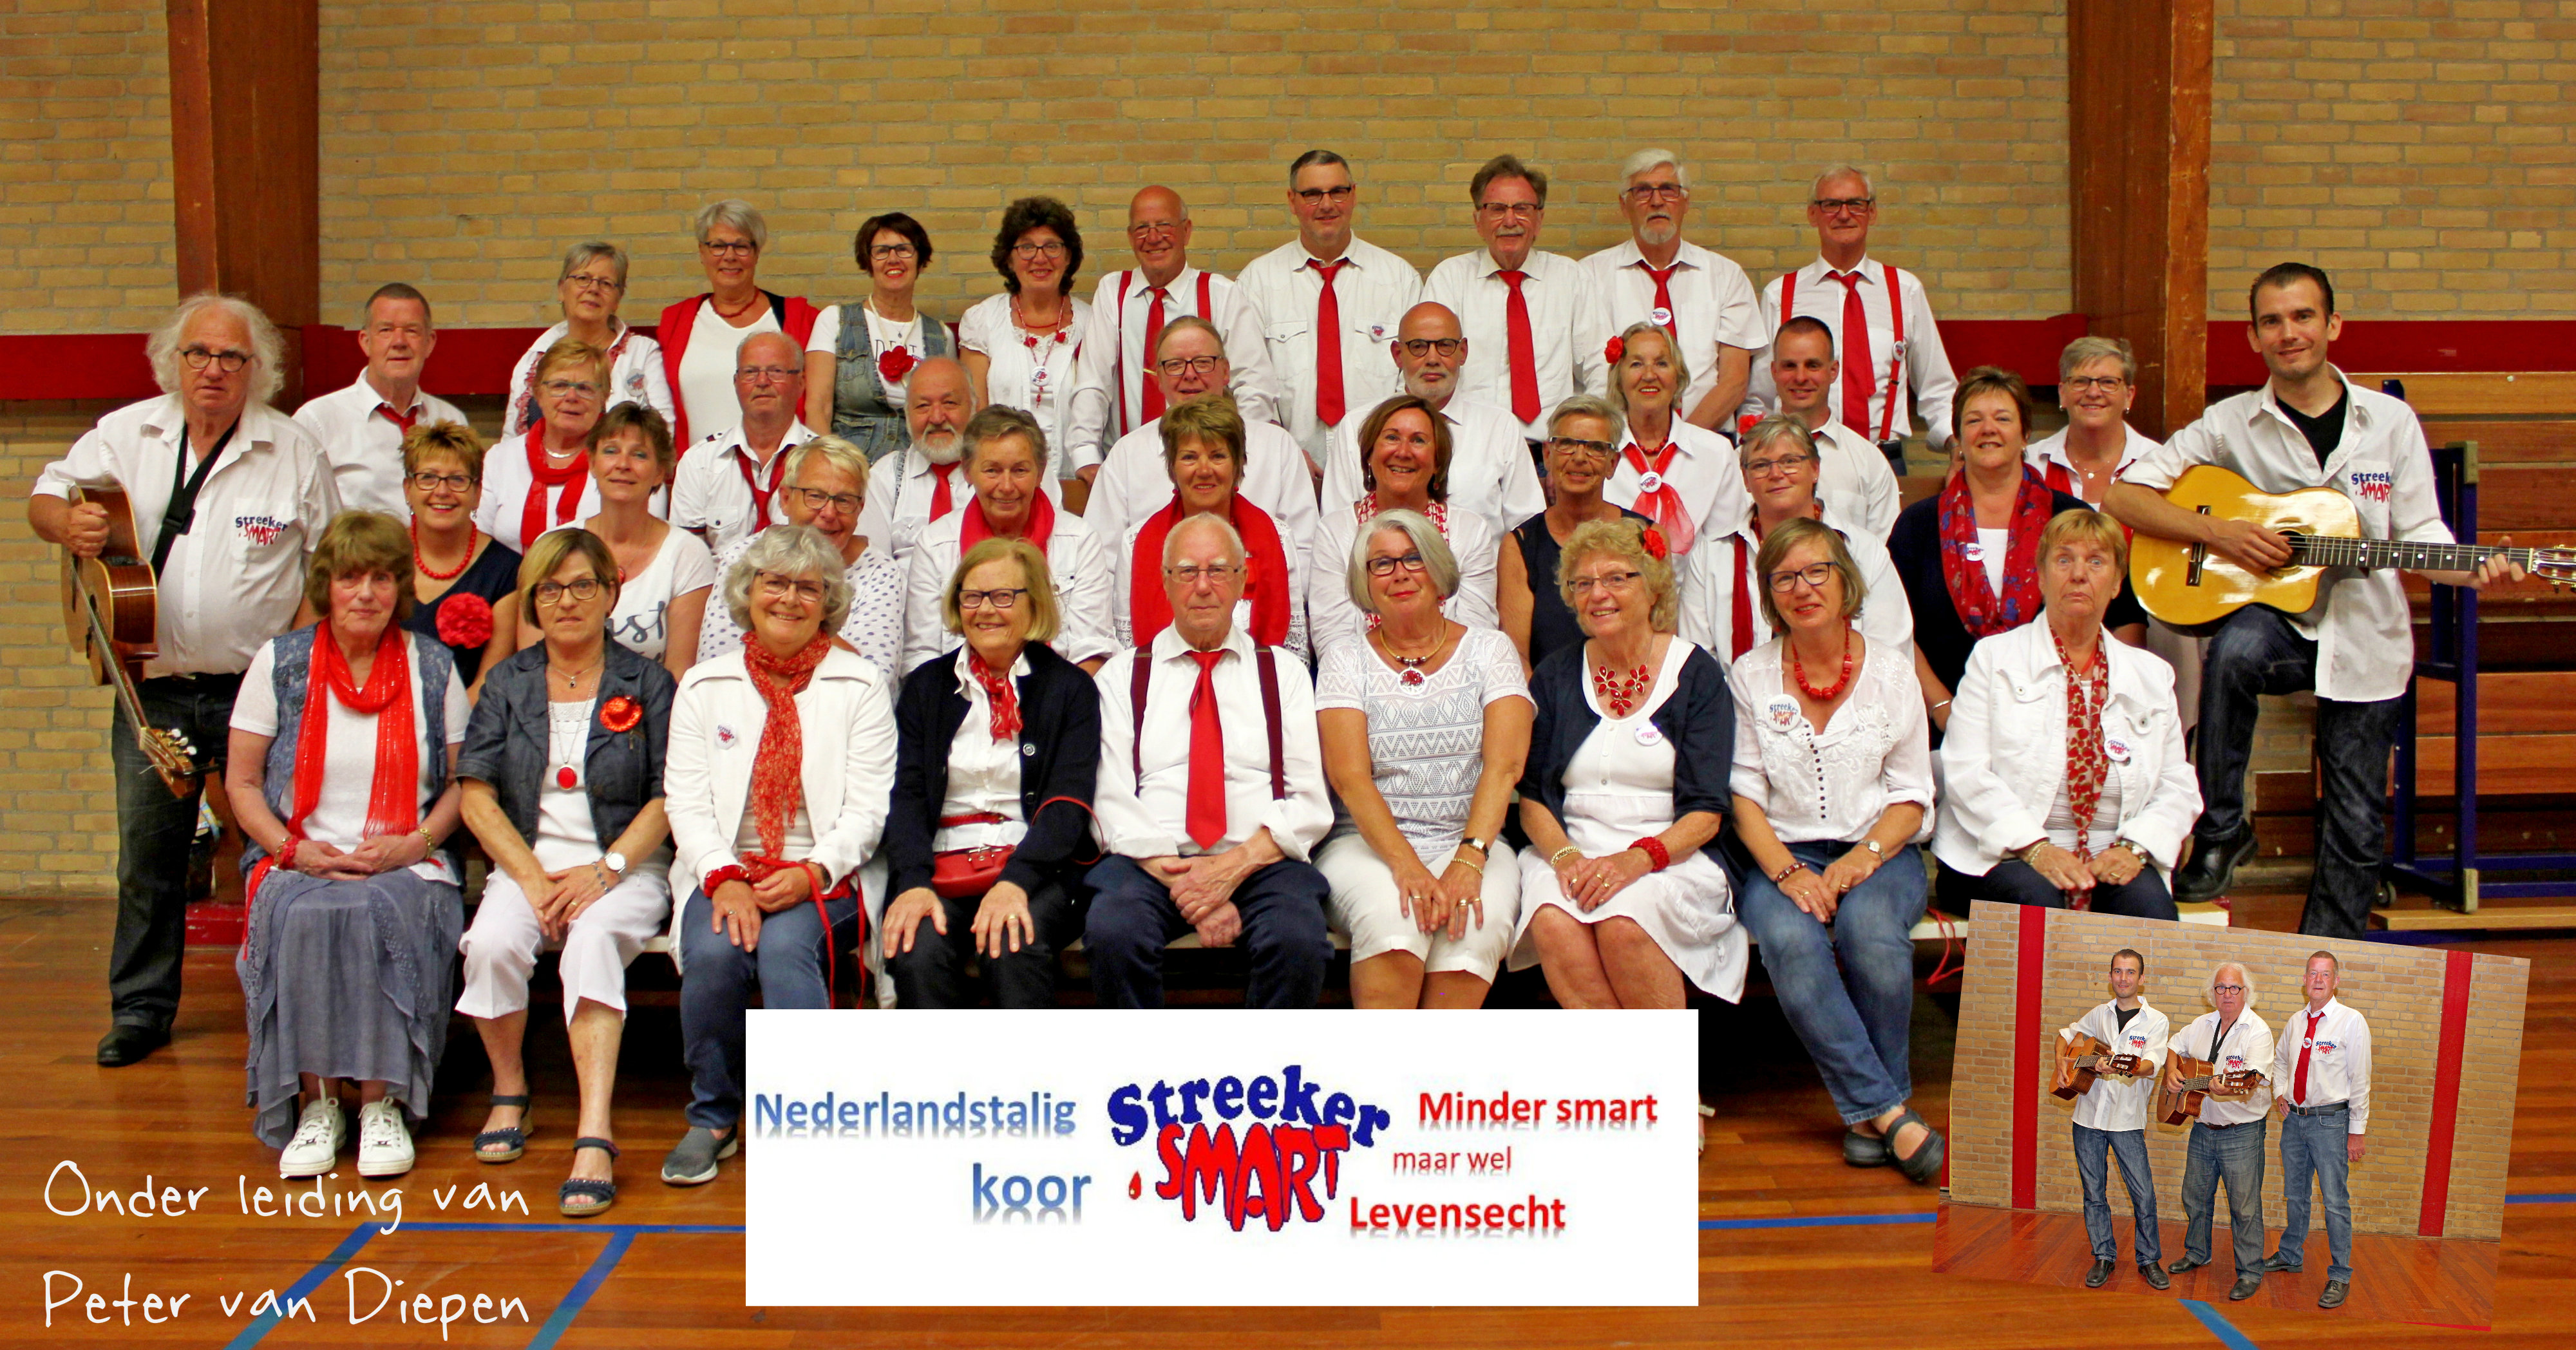 (c) Streekersmart.nl